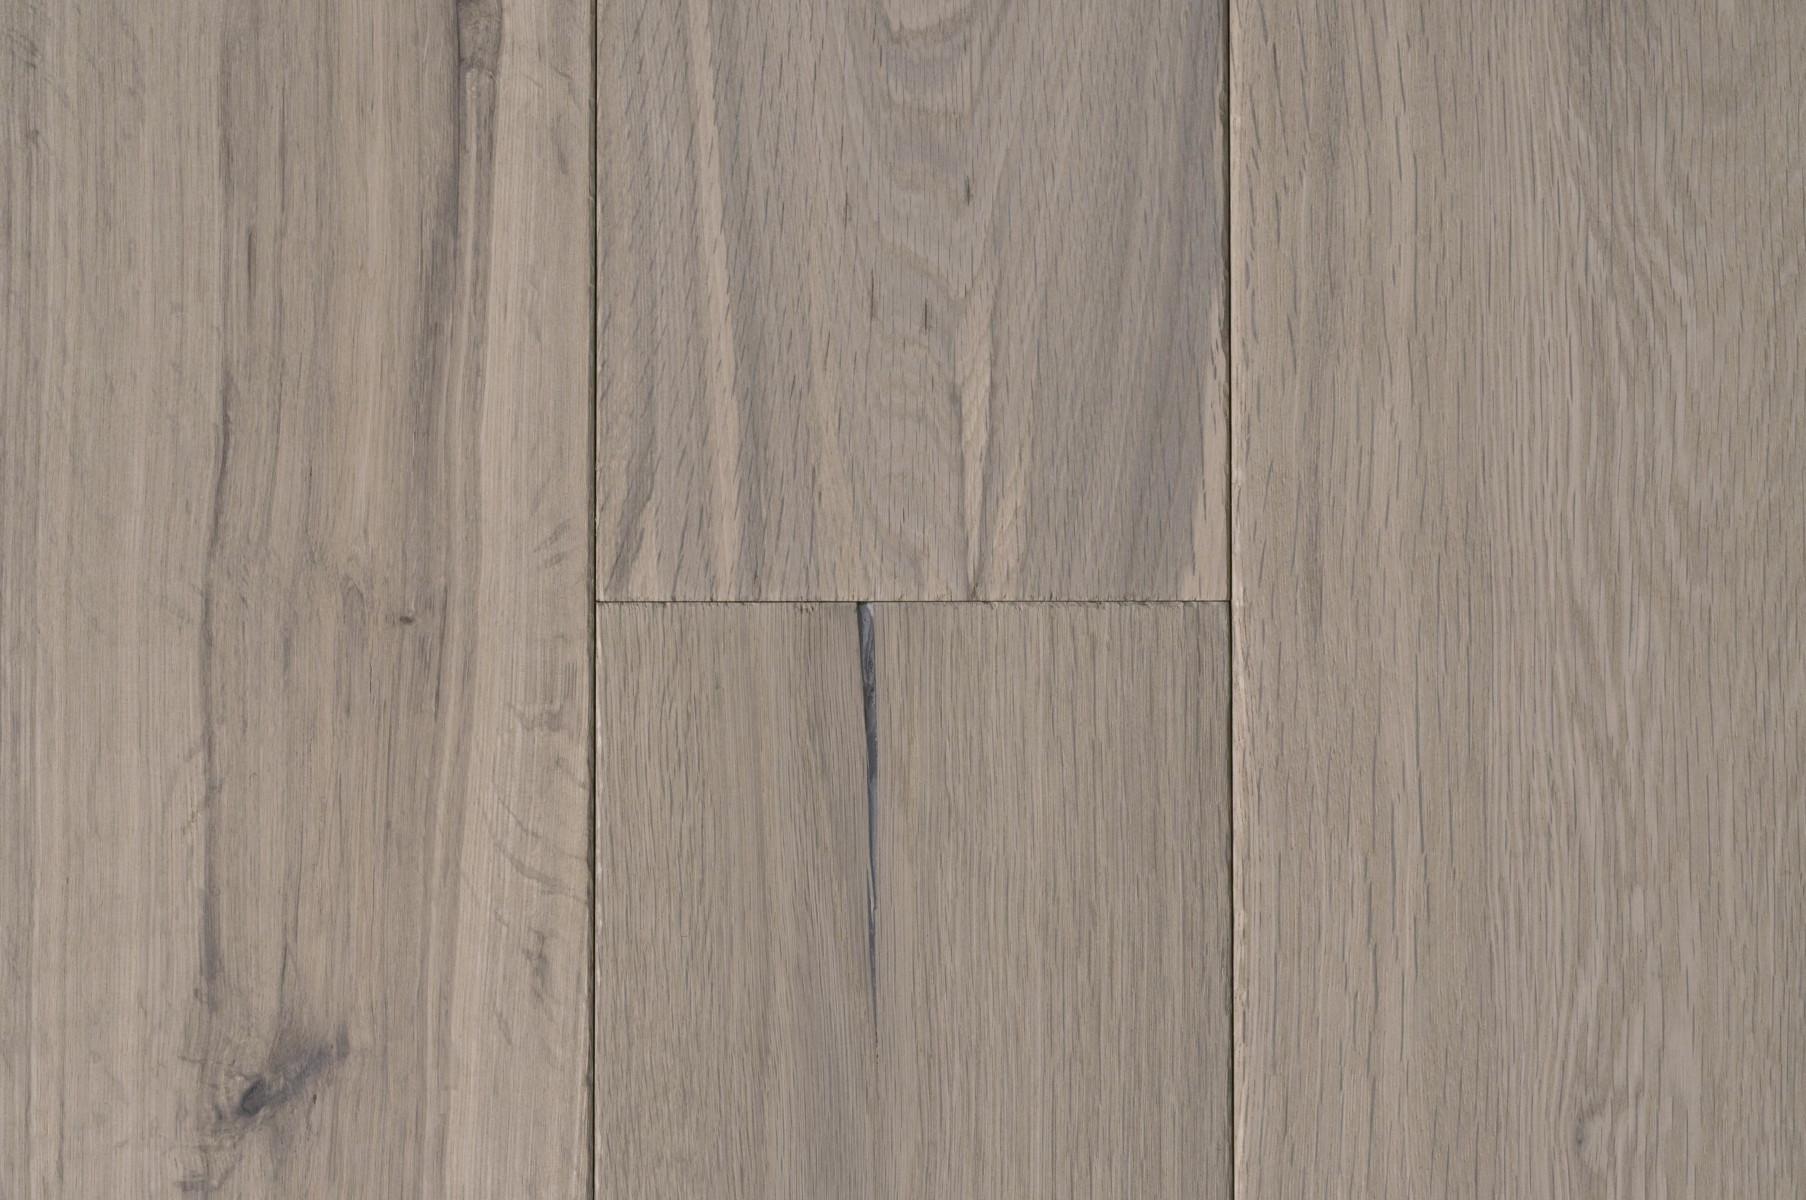 bruce hand scraped hardwood flooring of duchateau hardwood flooring houston tx discount engineered wood intended for antique white european oak